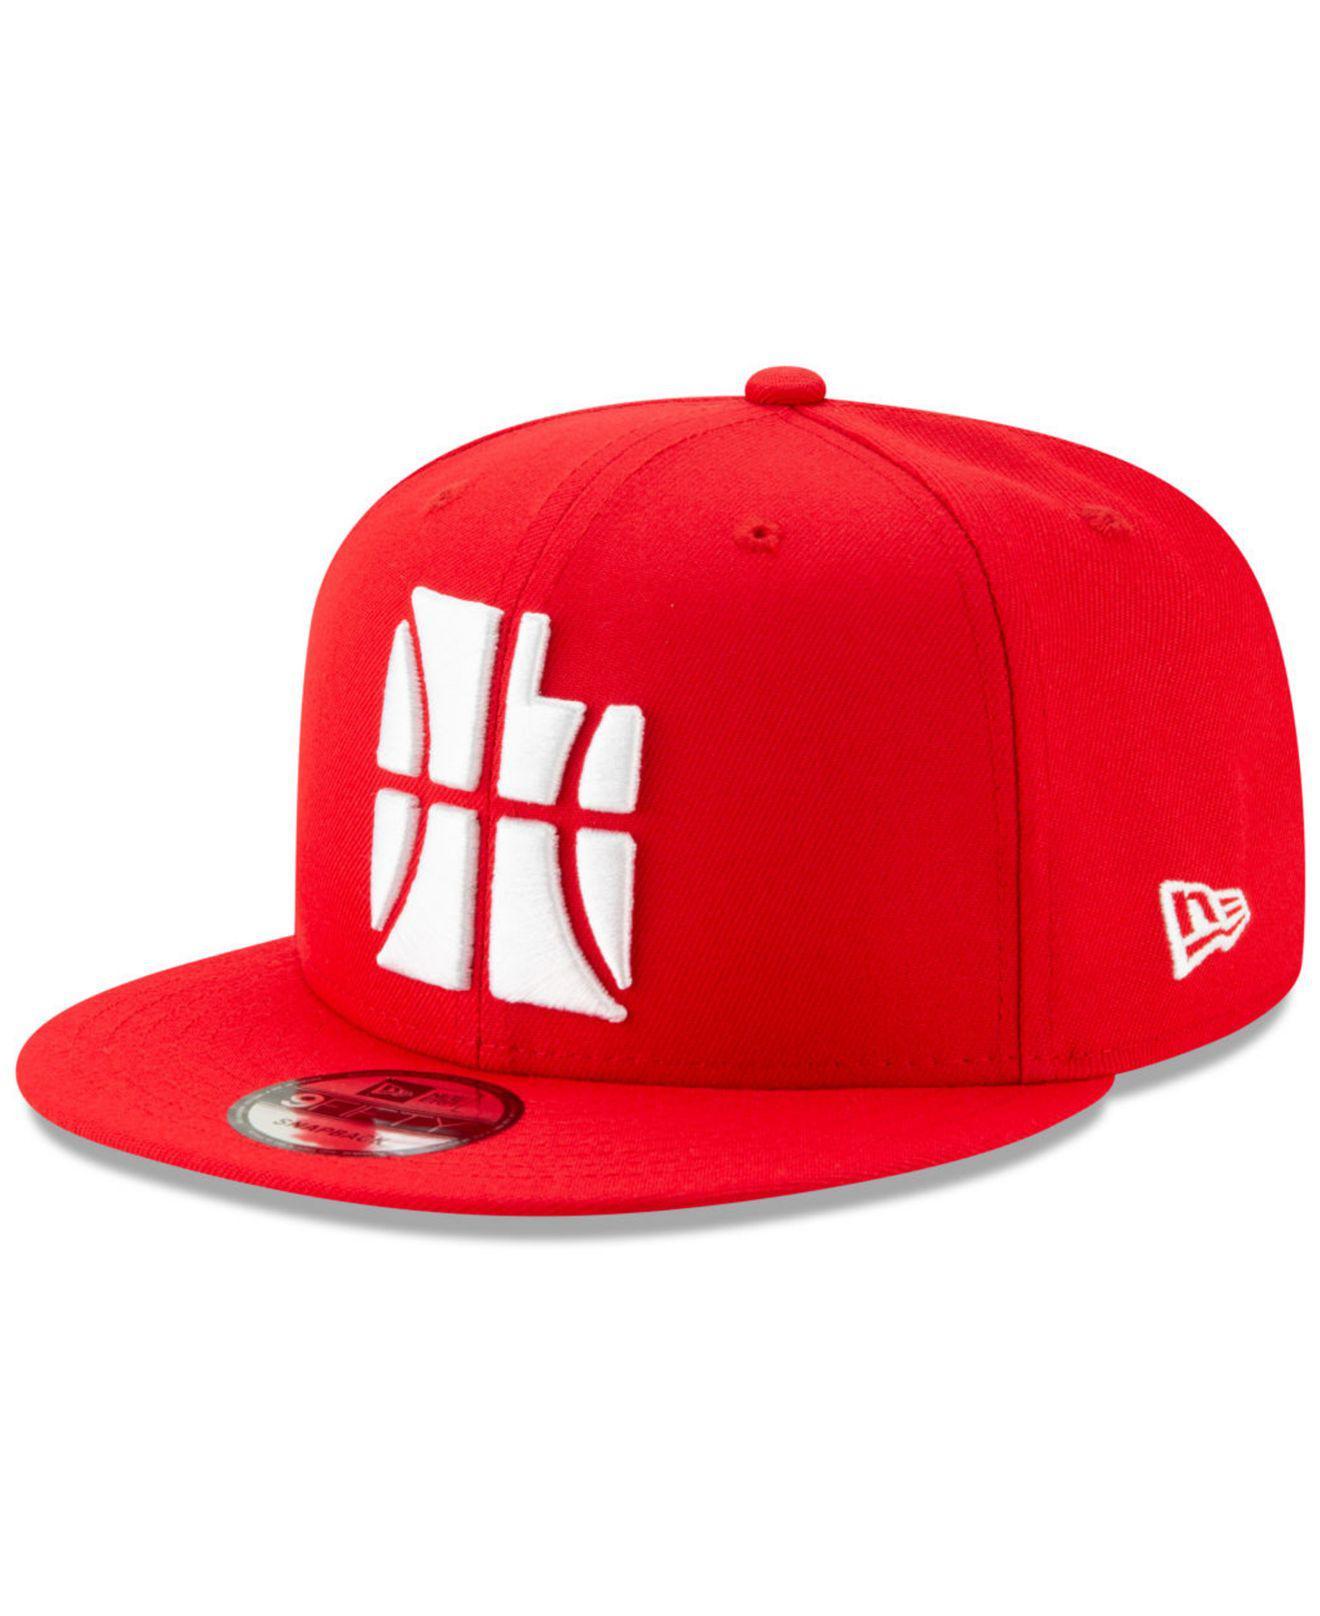 the best attitude 8e320 7033c KTZ Utah Jazz City Series 2.0 9fifty Snapback Cap in Red for Men - Lyst